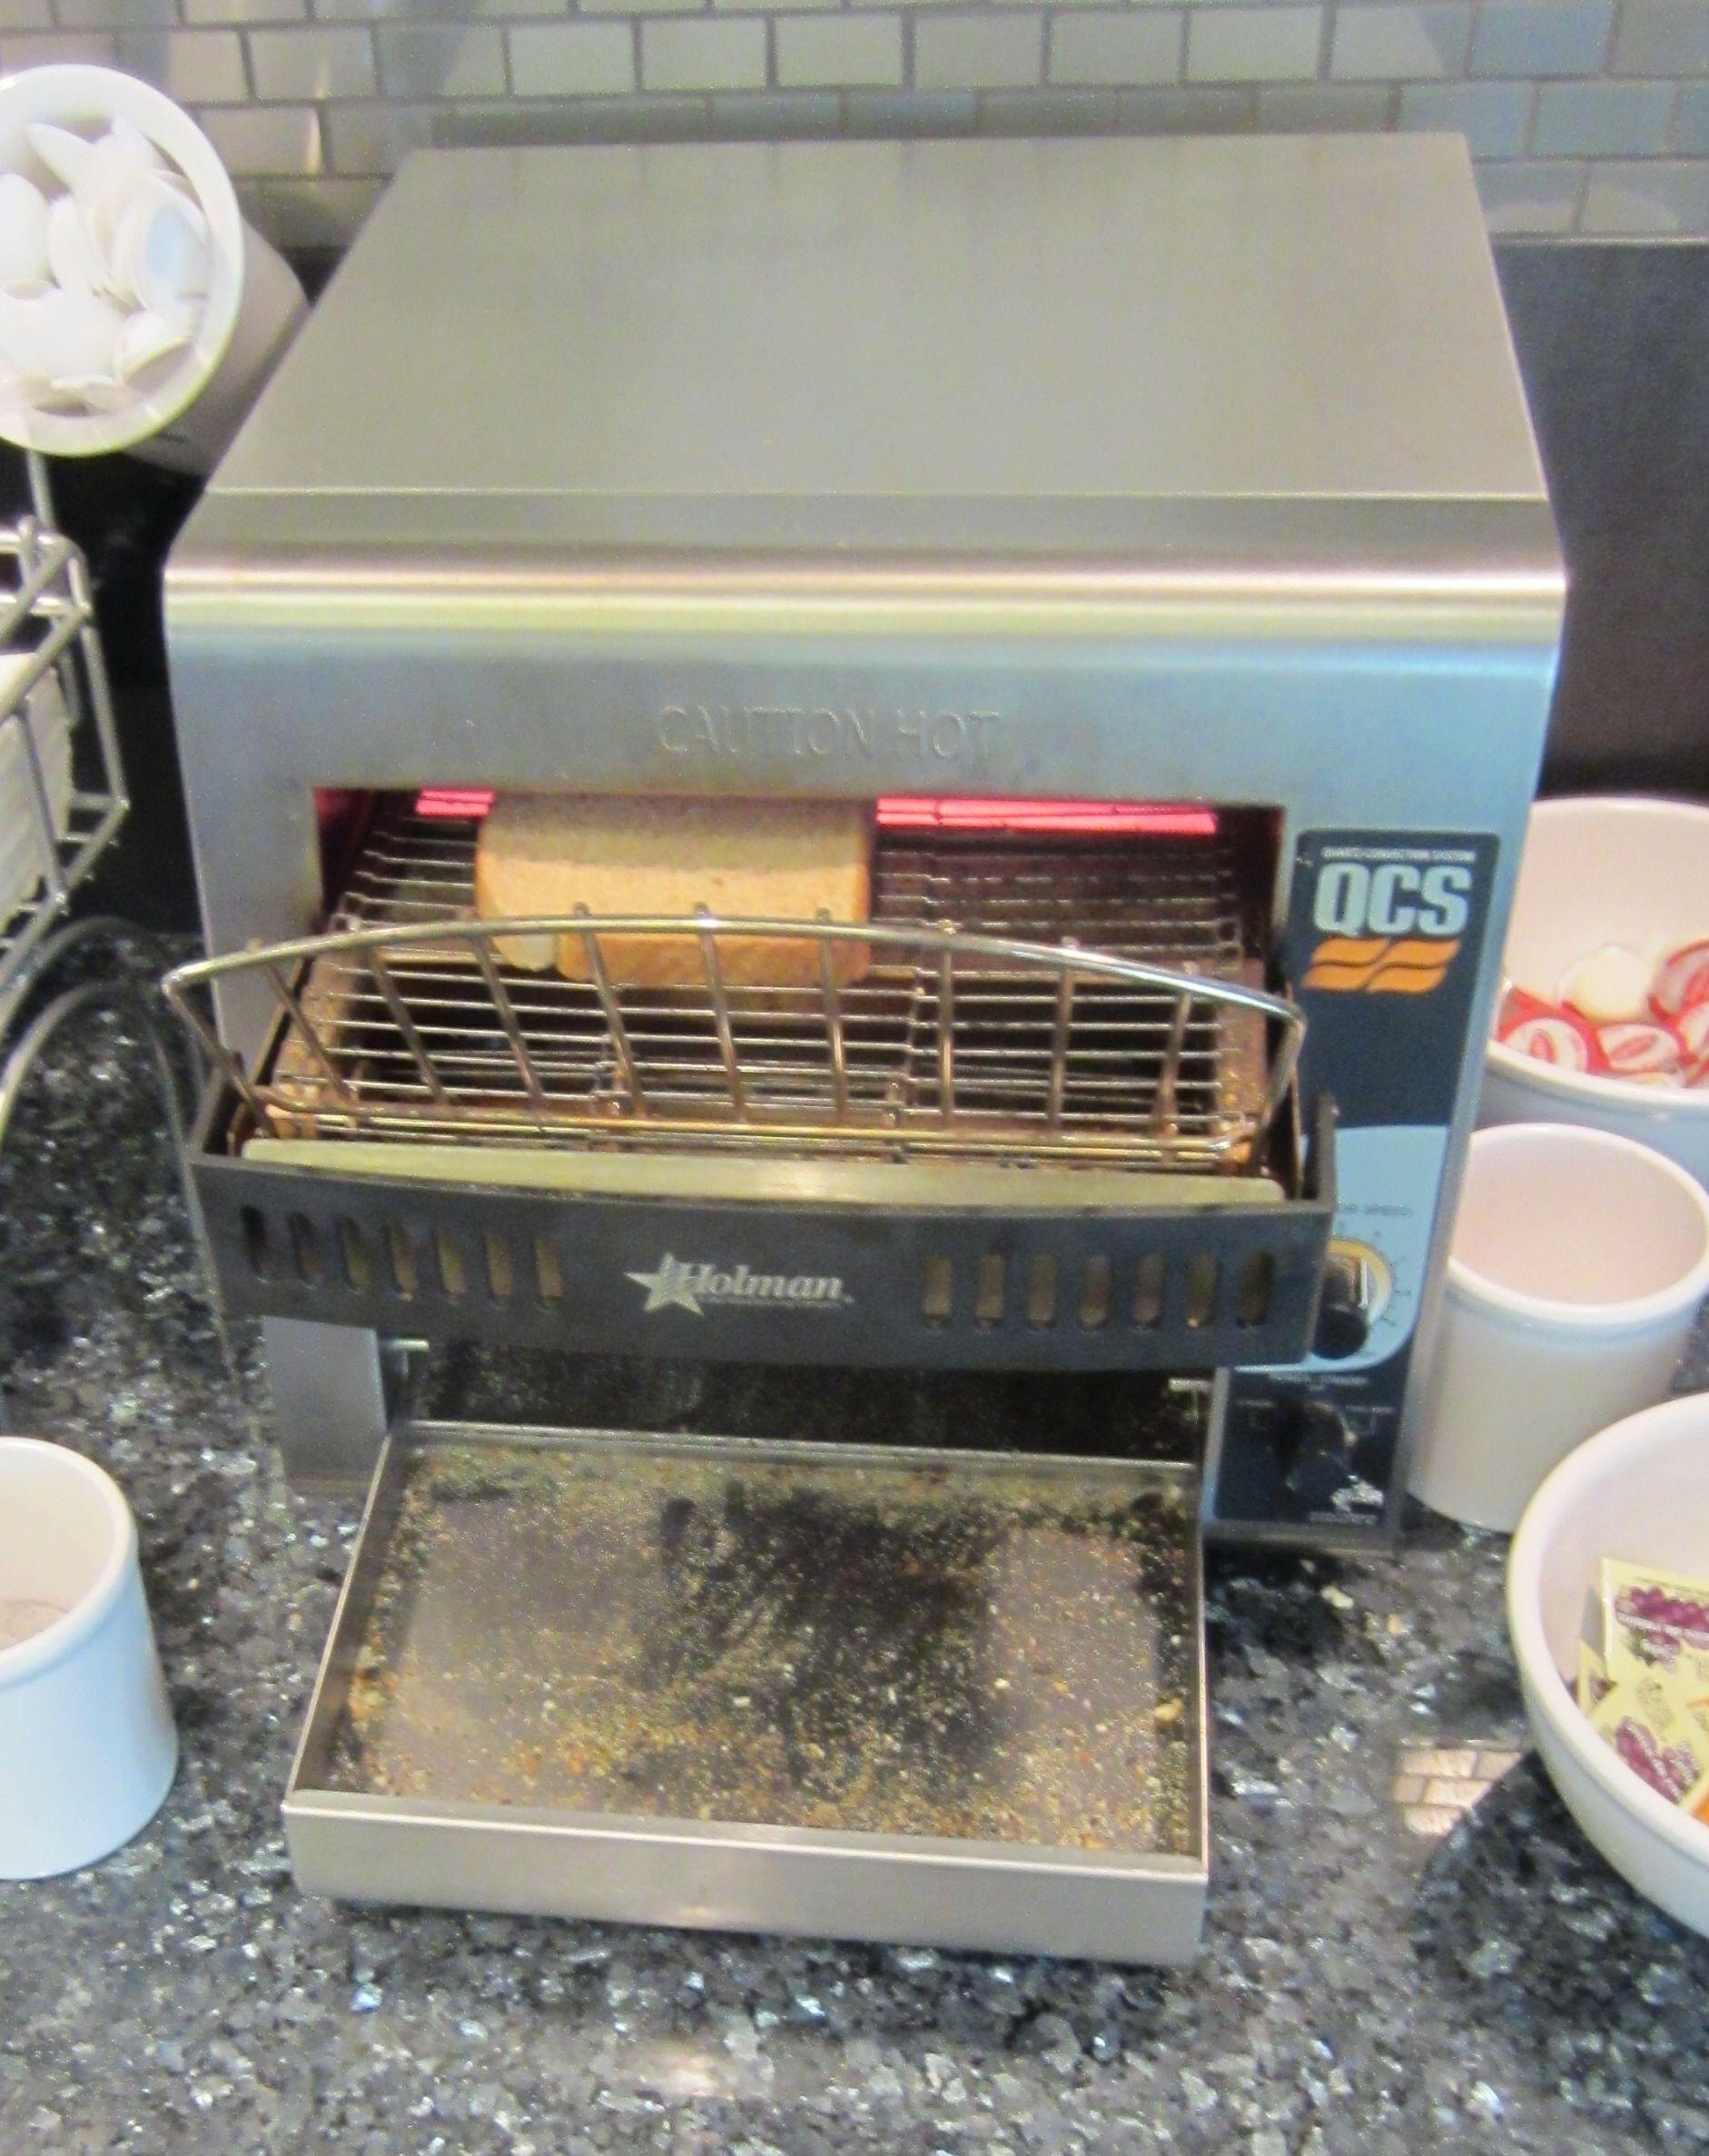 File Conveyor toaster Wikimedia mons